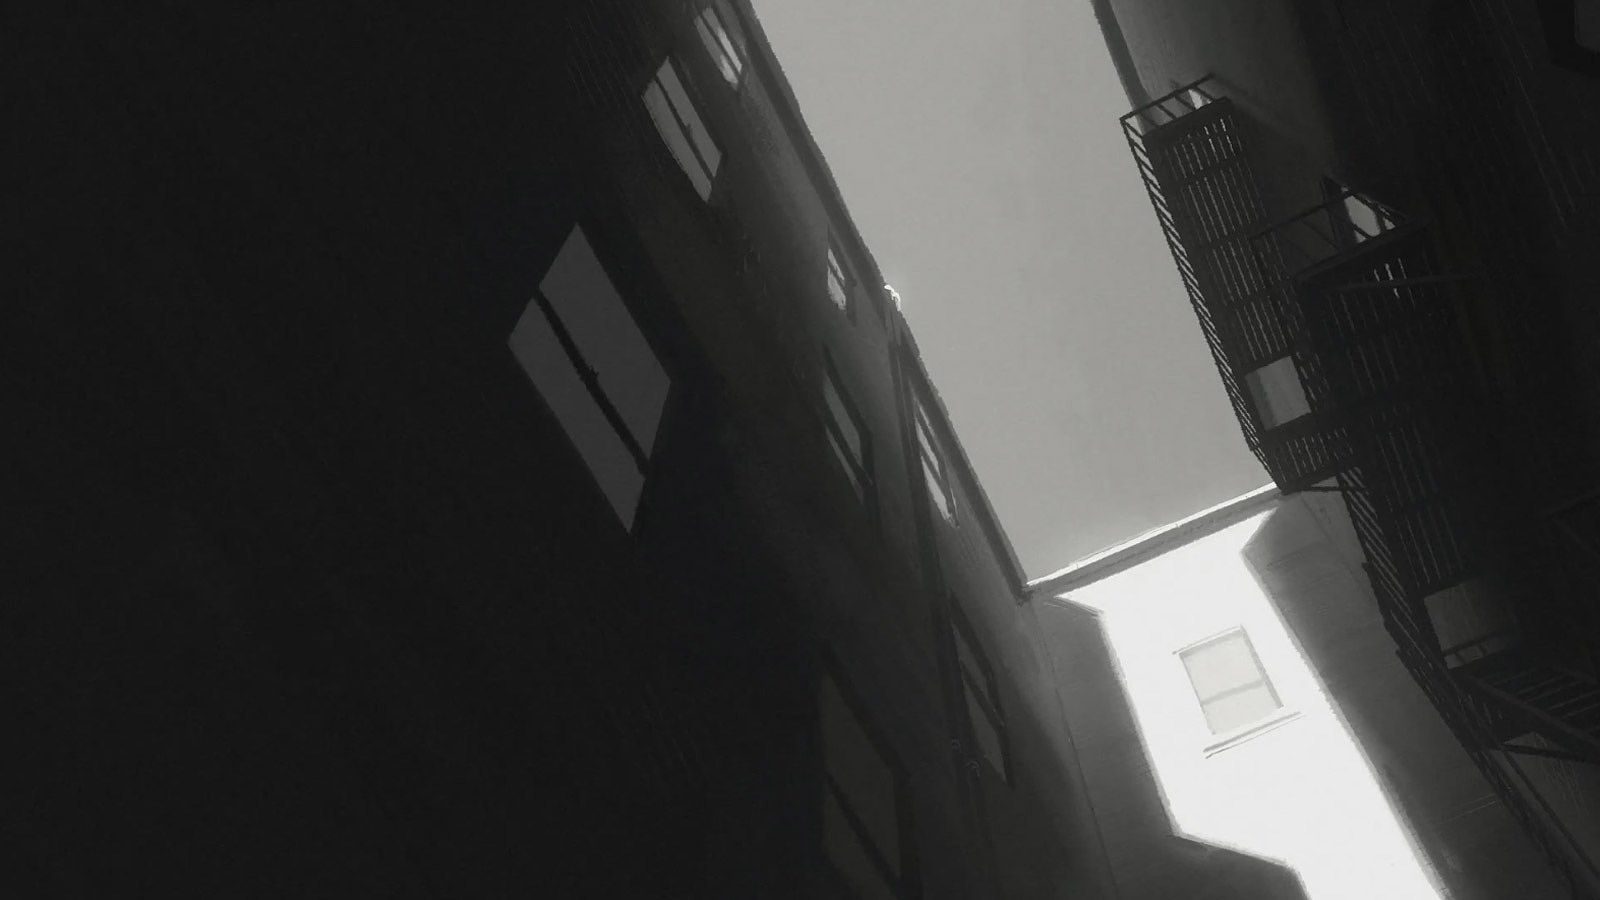 paperman-background-26.jpg